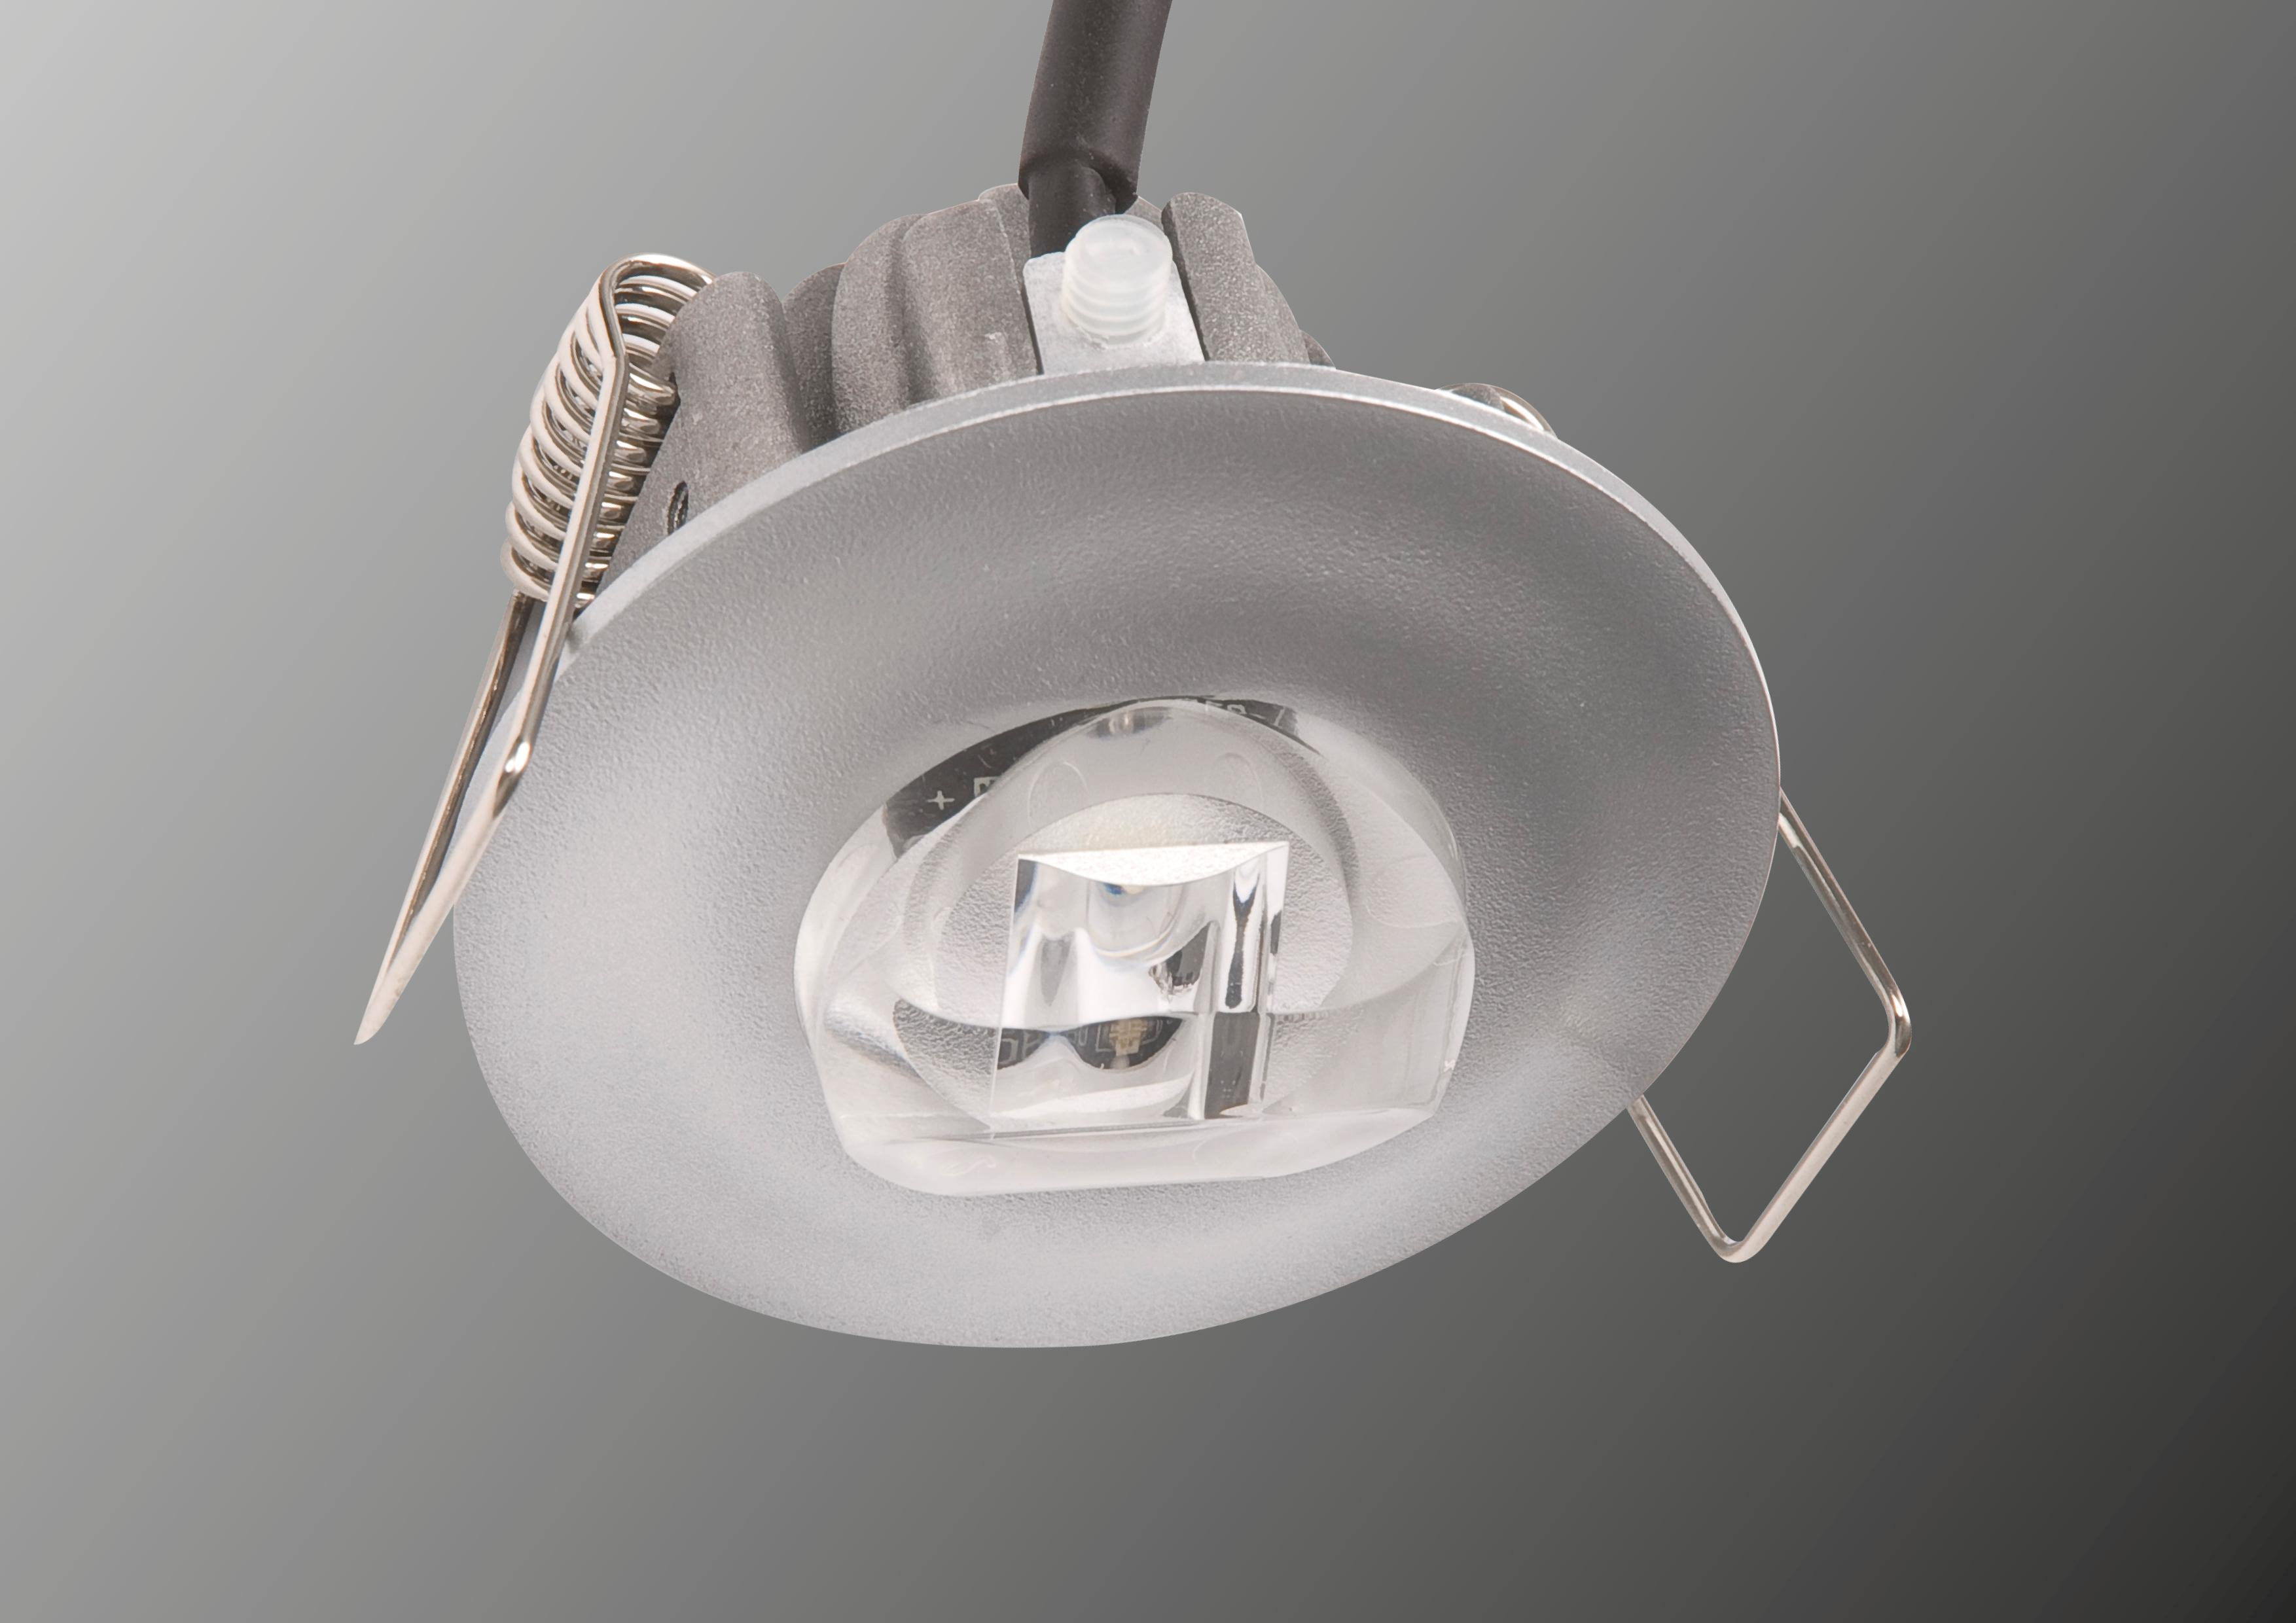 https://contrac-lighting.co.uk/wp-content/uploads/2019/03/EMDOT-GREY.jpg